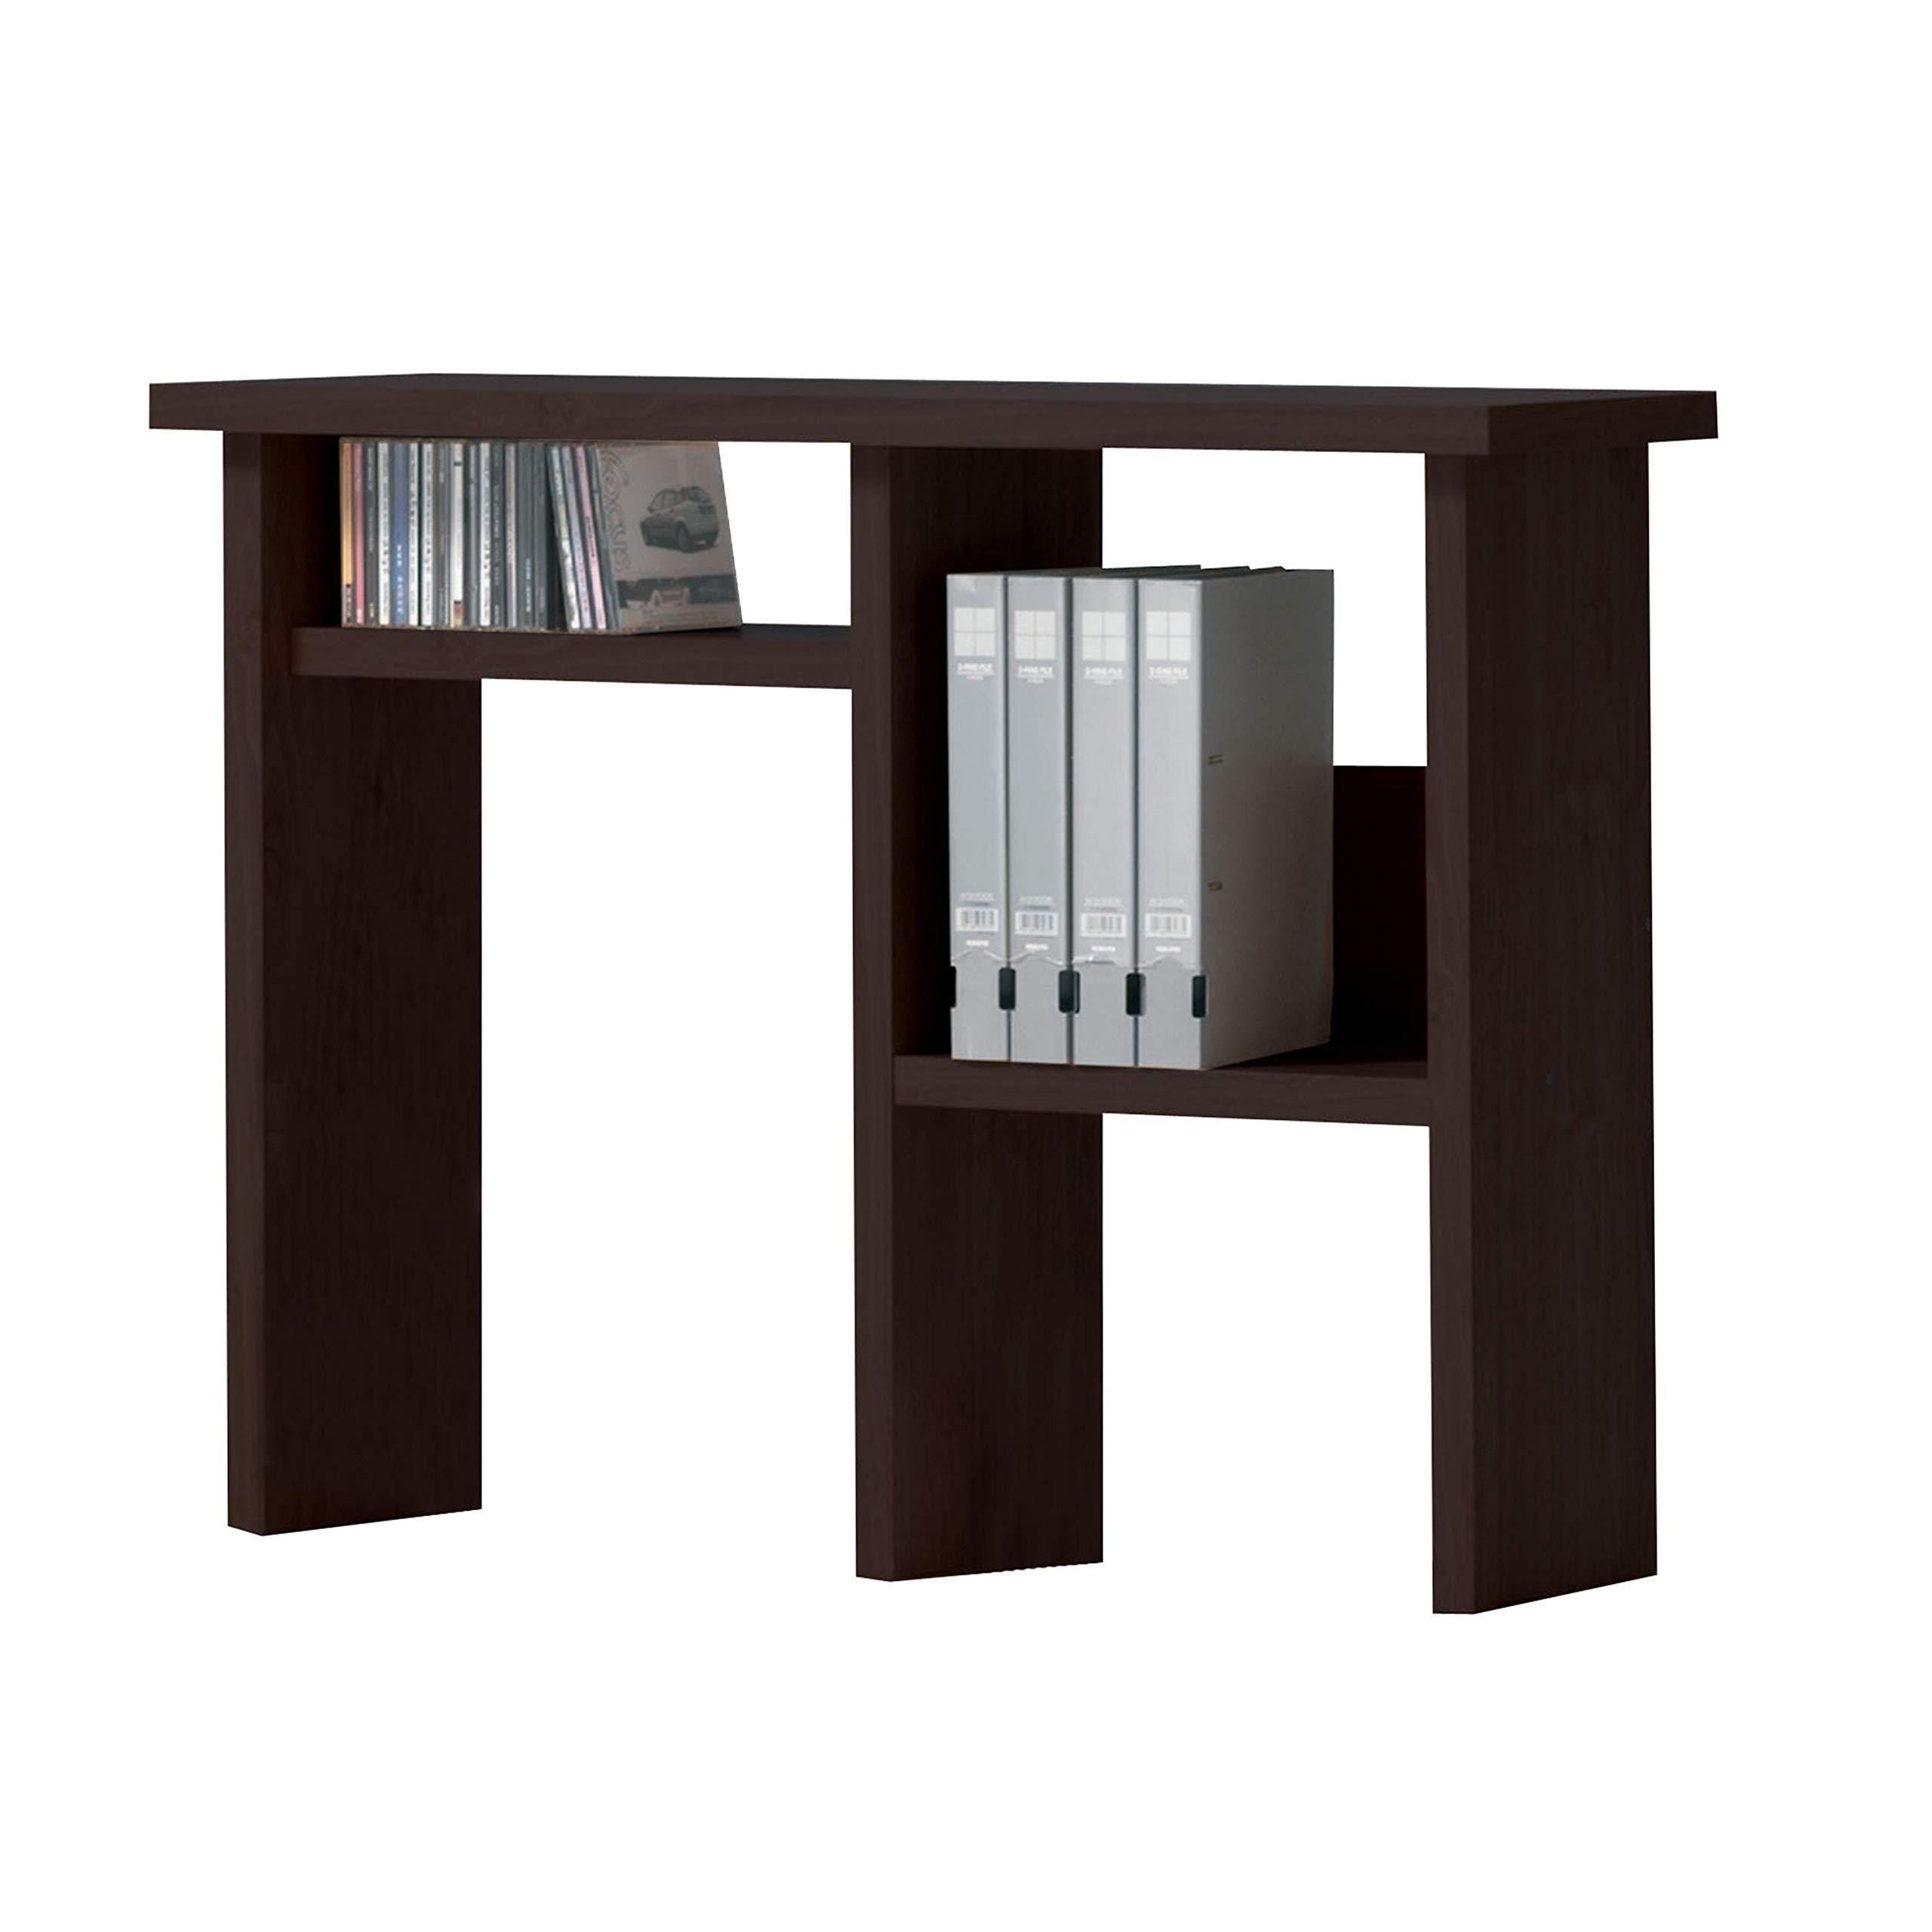 Benzara BM177549 Wooden Computer Hutch with Open Shelves, Brown